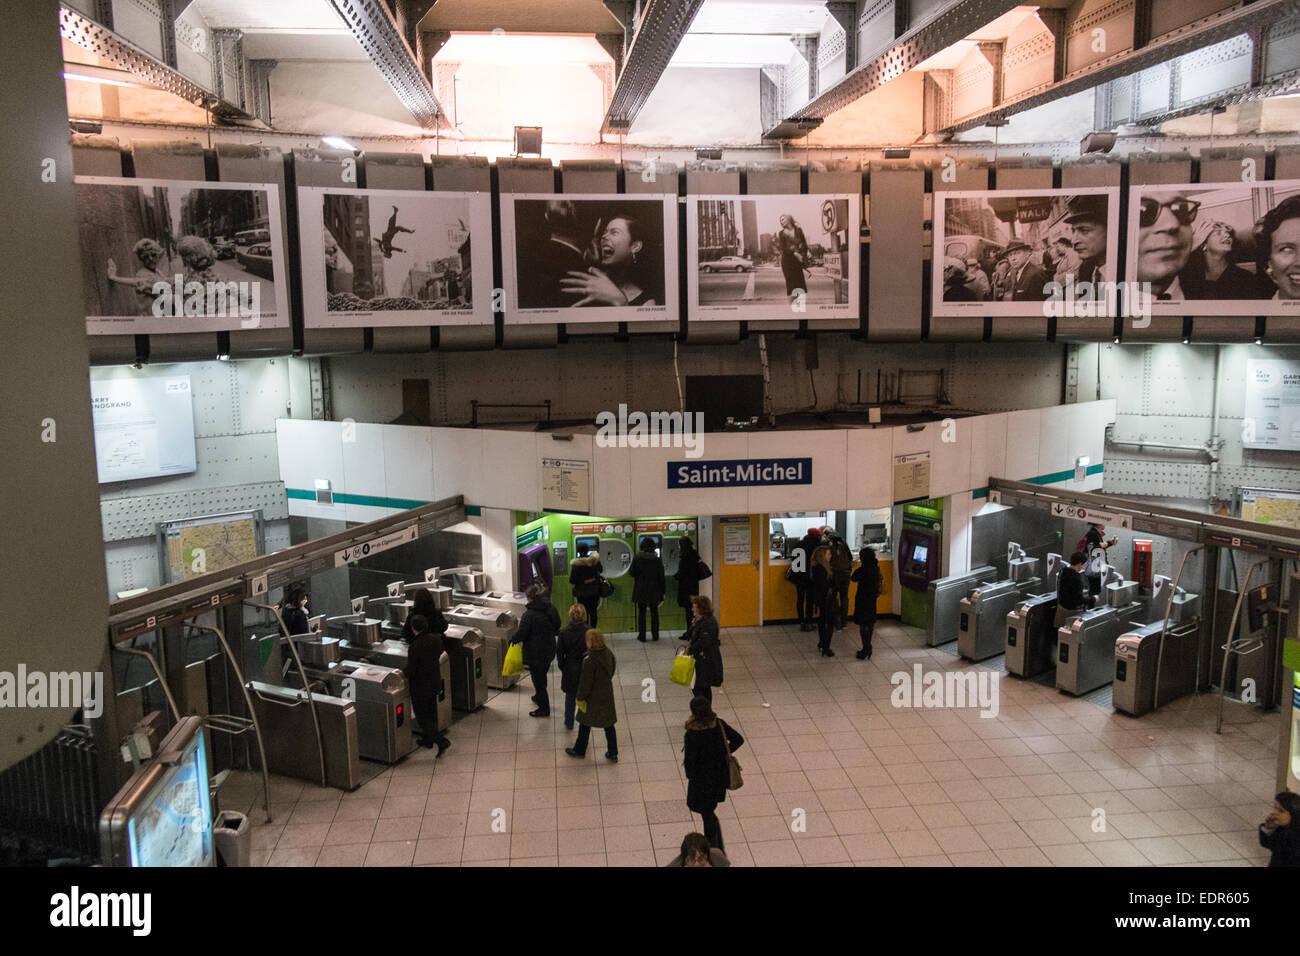 Huge black and white photography prints at saint michel metro train stock photo royalty free - Saint michel paris metro ...